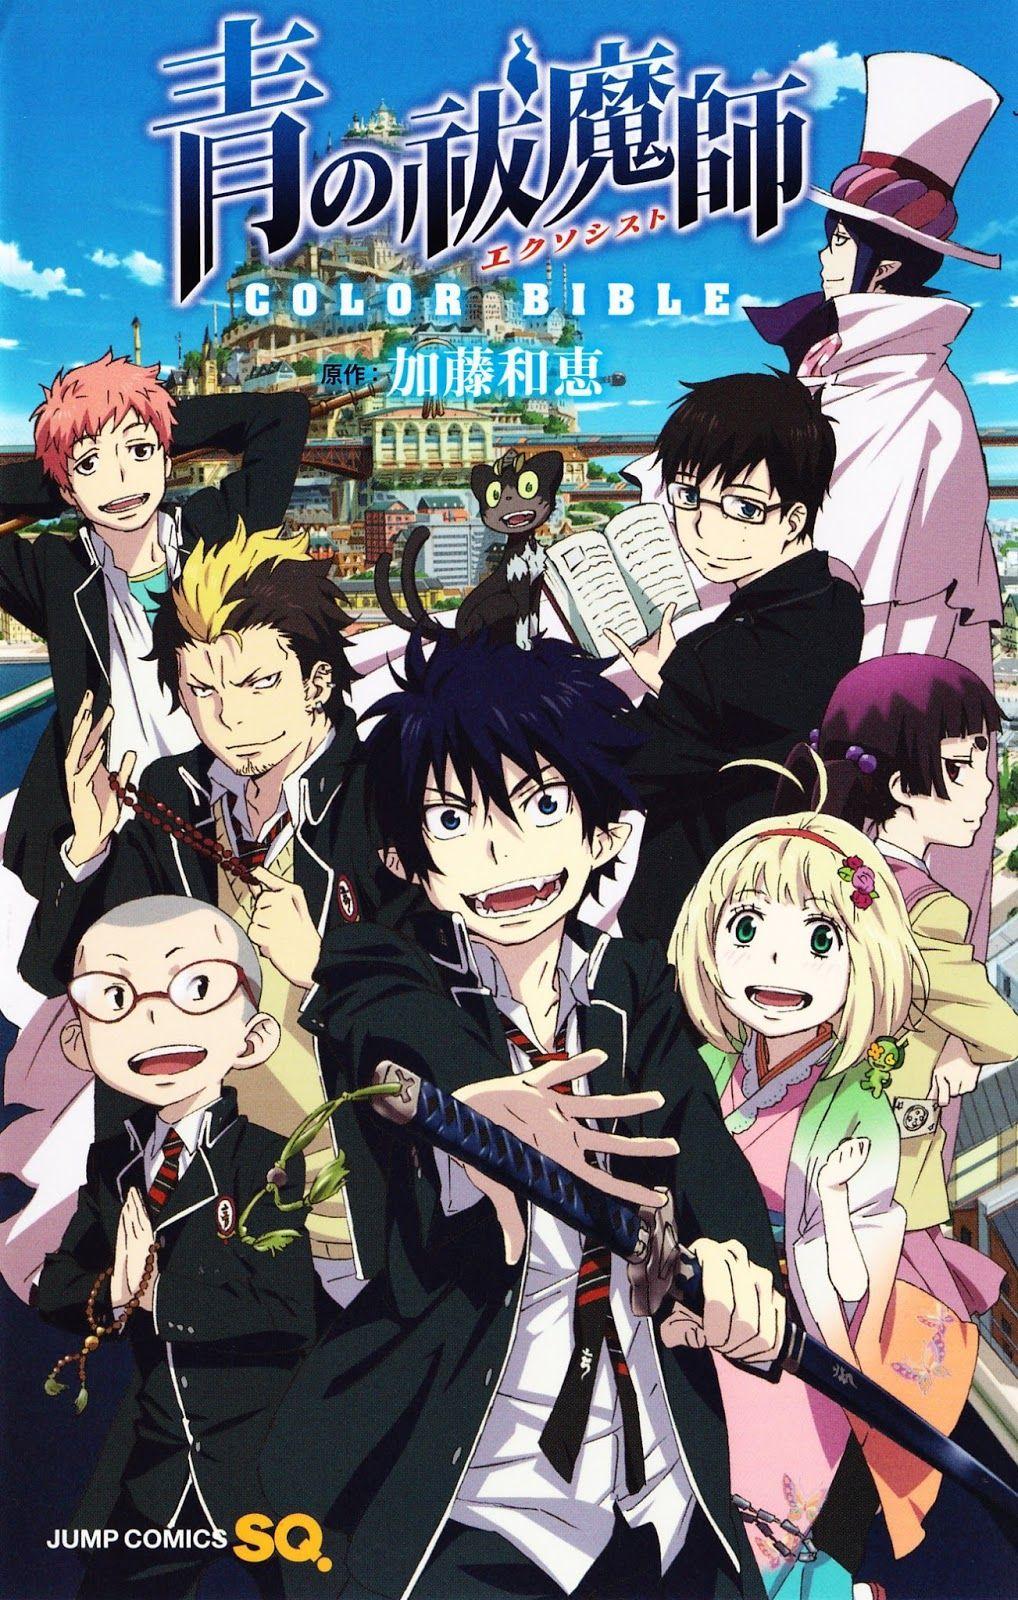 Manga Que Sigue Al Ultimo Capitulo Del Anime Ao No Exorcist Manga Continua Anime Exorcist Anime Blue Exorcist Blue Exorcist Anime